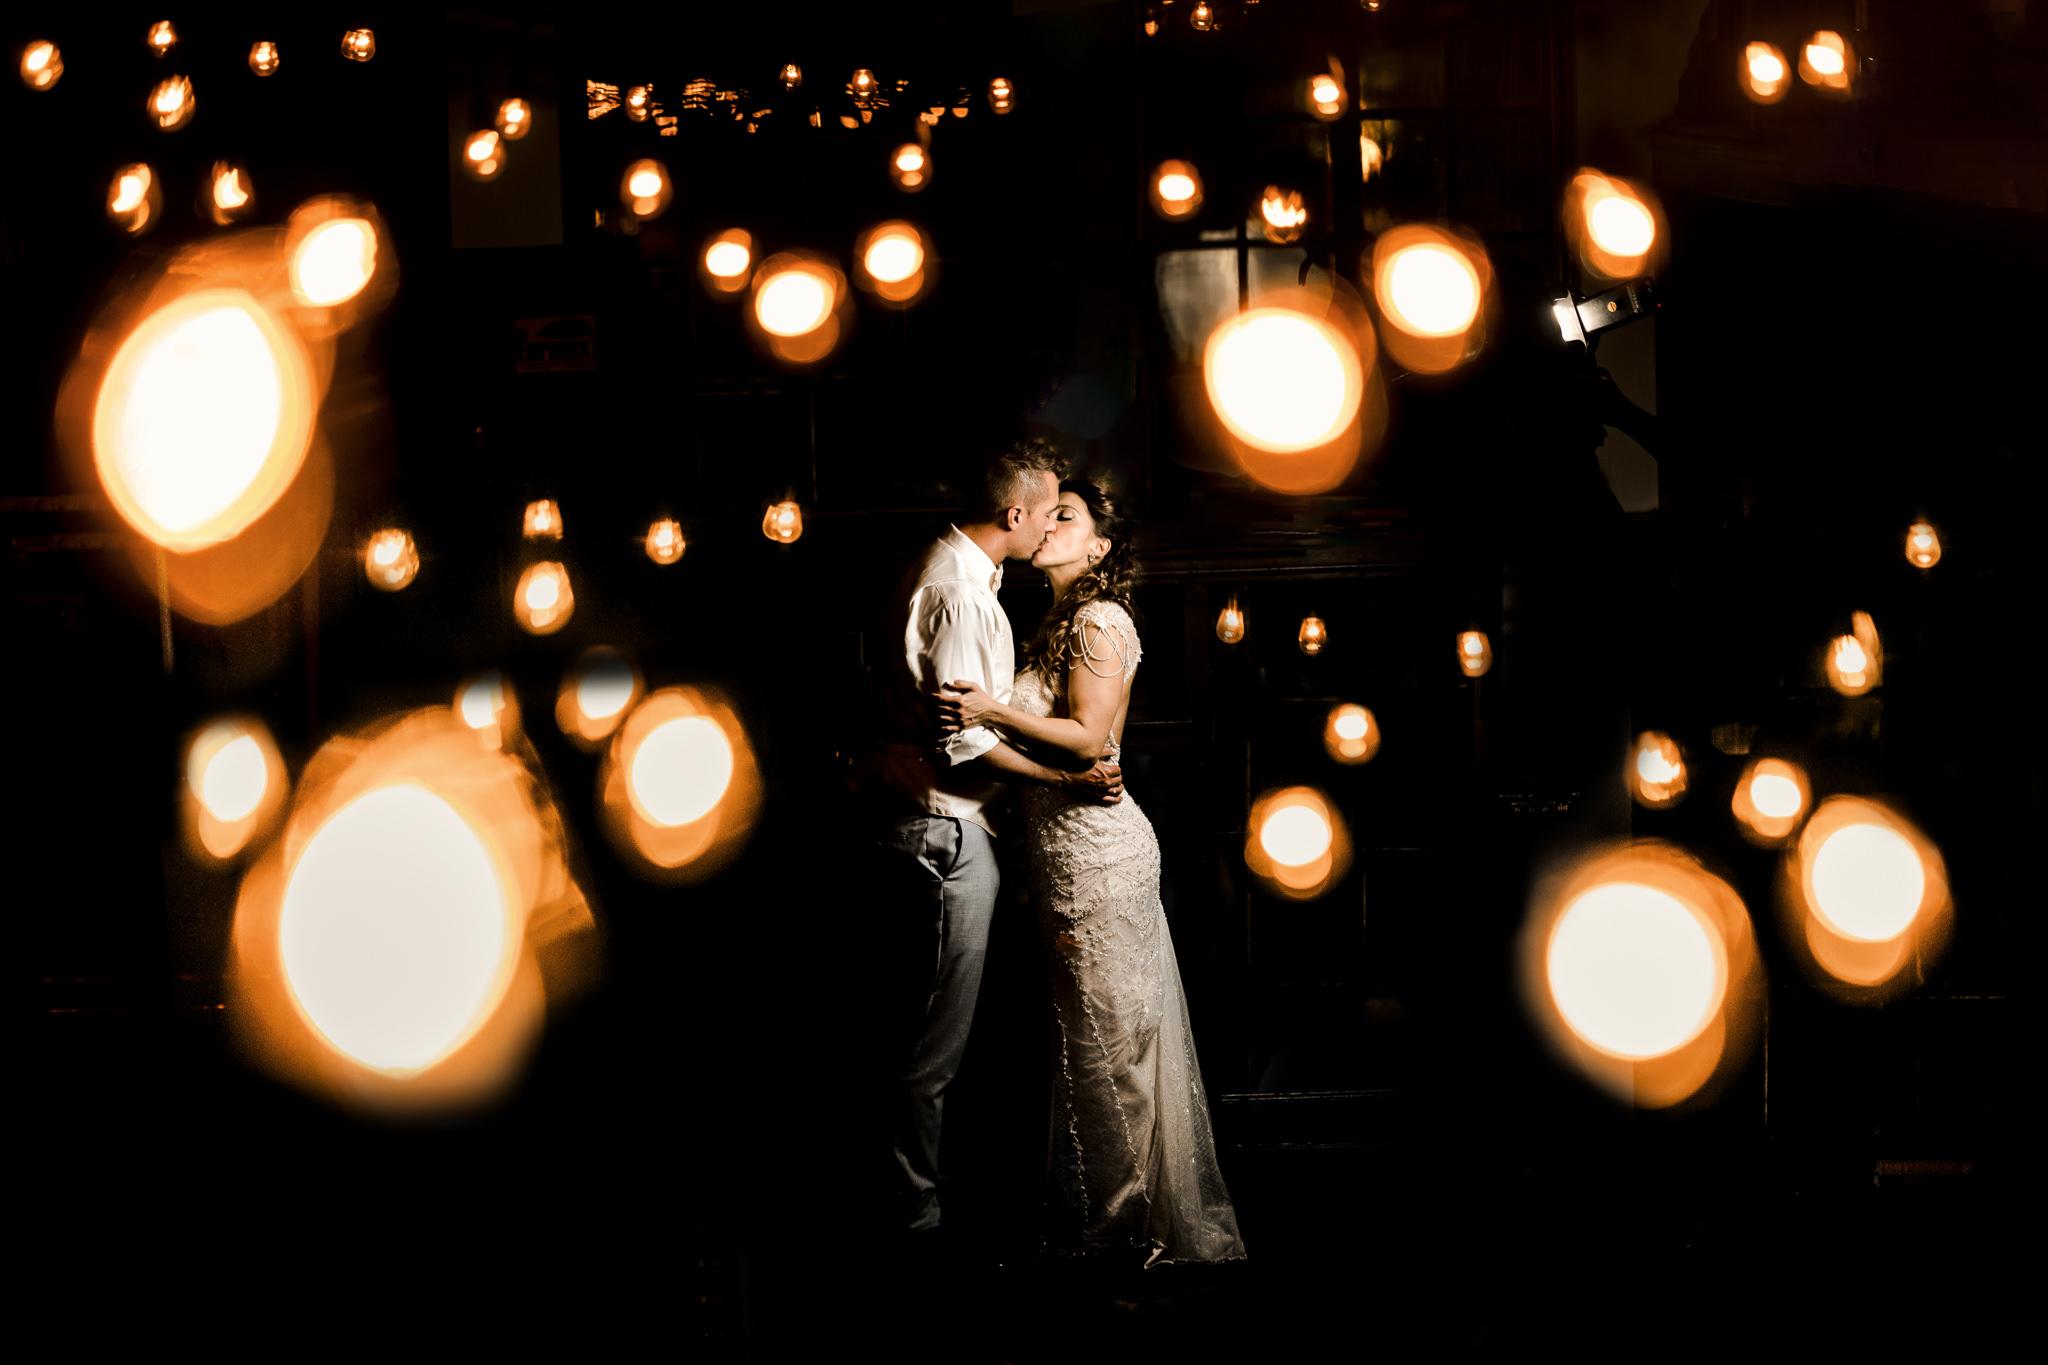 Barbato-Moorestown-Community-House-Wedding-New-Jersey-Photographer-47.JPG